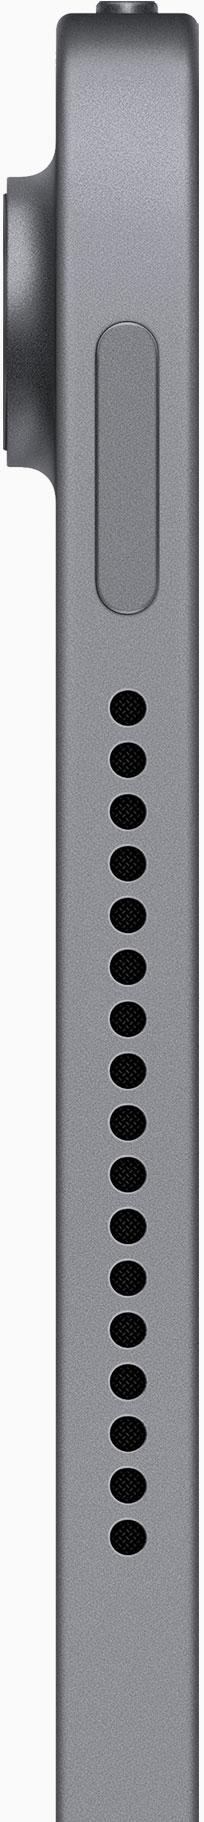 Apple iPad Pro 2018 Tablet Computer CCT Communikation Uwe Gillner Augsburg Handy Smartphone Mobilfunk Internet Telekom Vodafone o2 Mobilcom Debitel Mnet Service Update Vertragsverlängerung.jpg